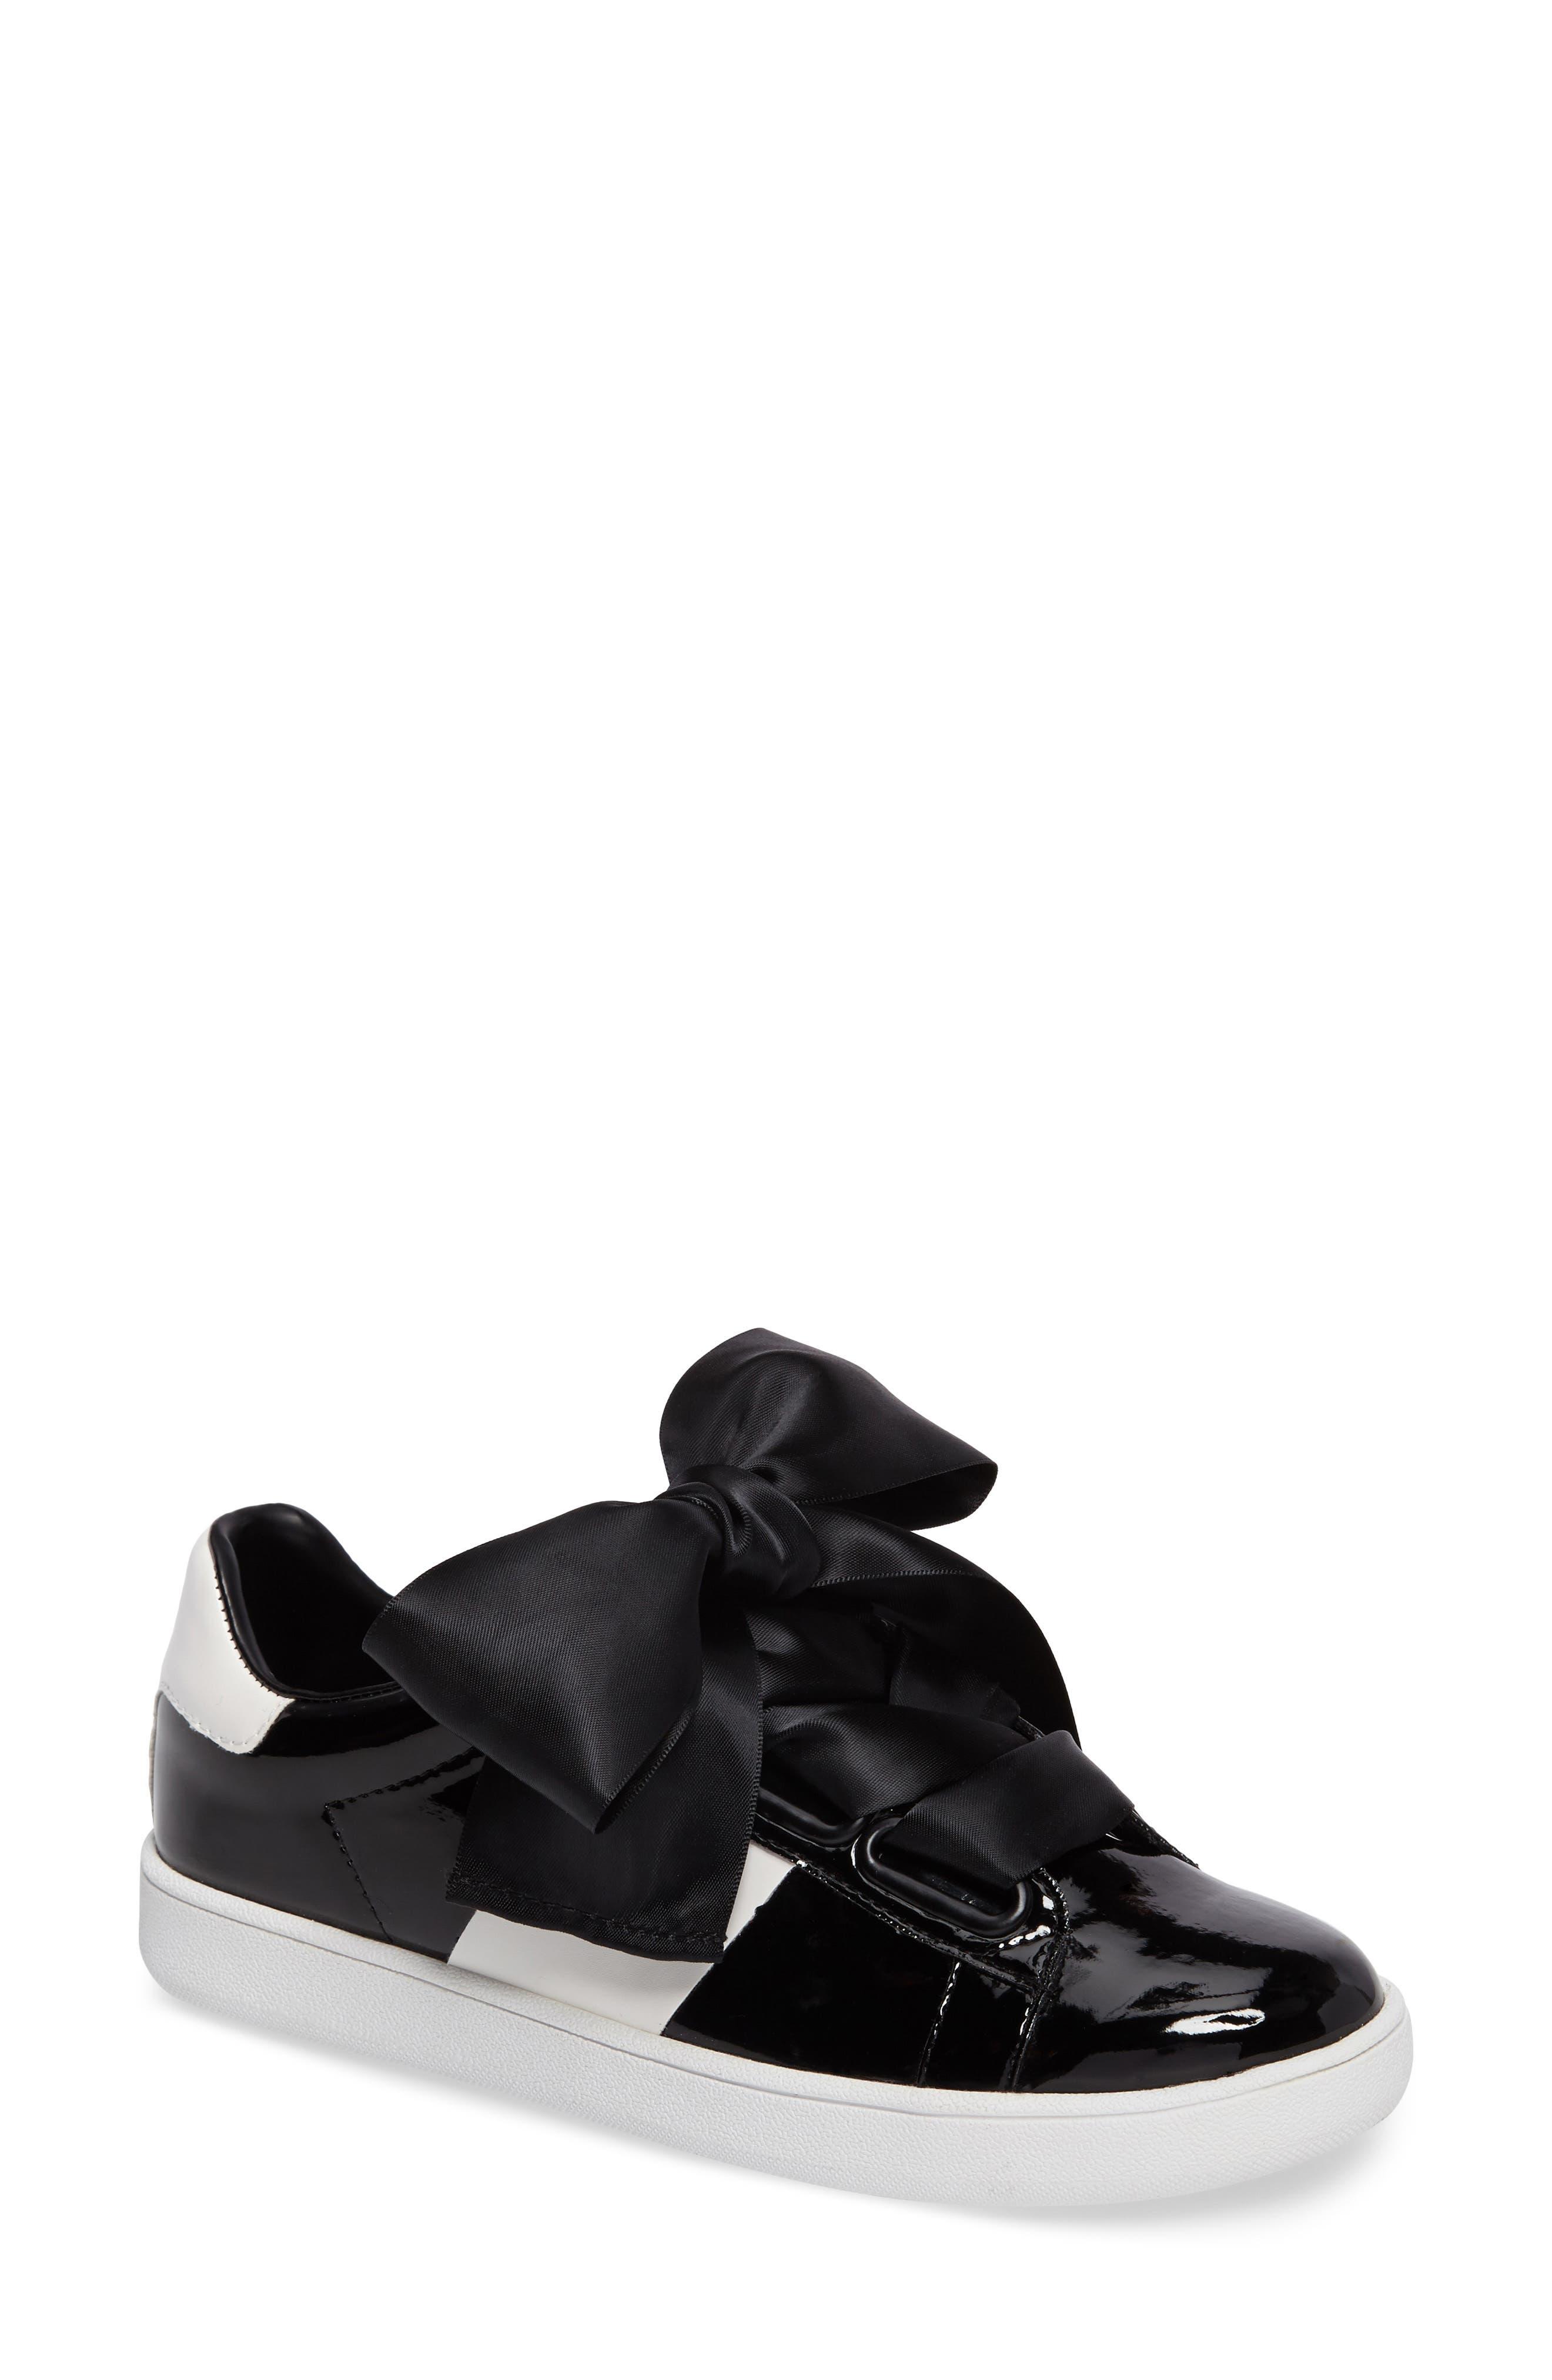 Pabst Low-Top Sneaker,                             Main thumbnail 4, color,